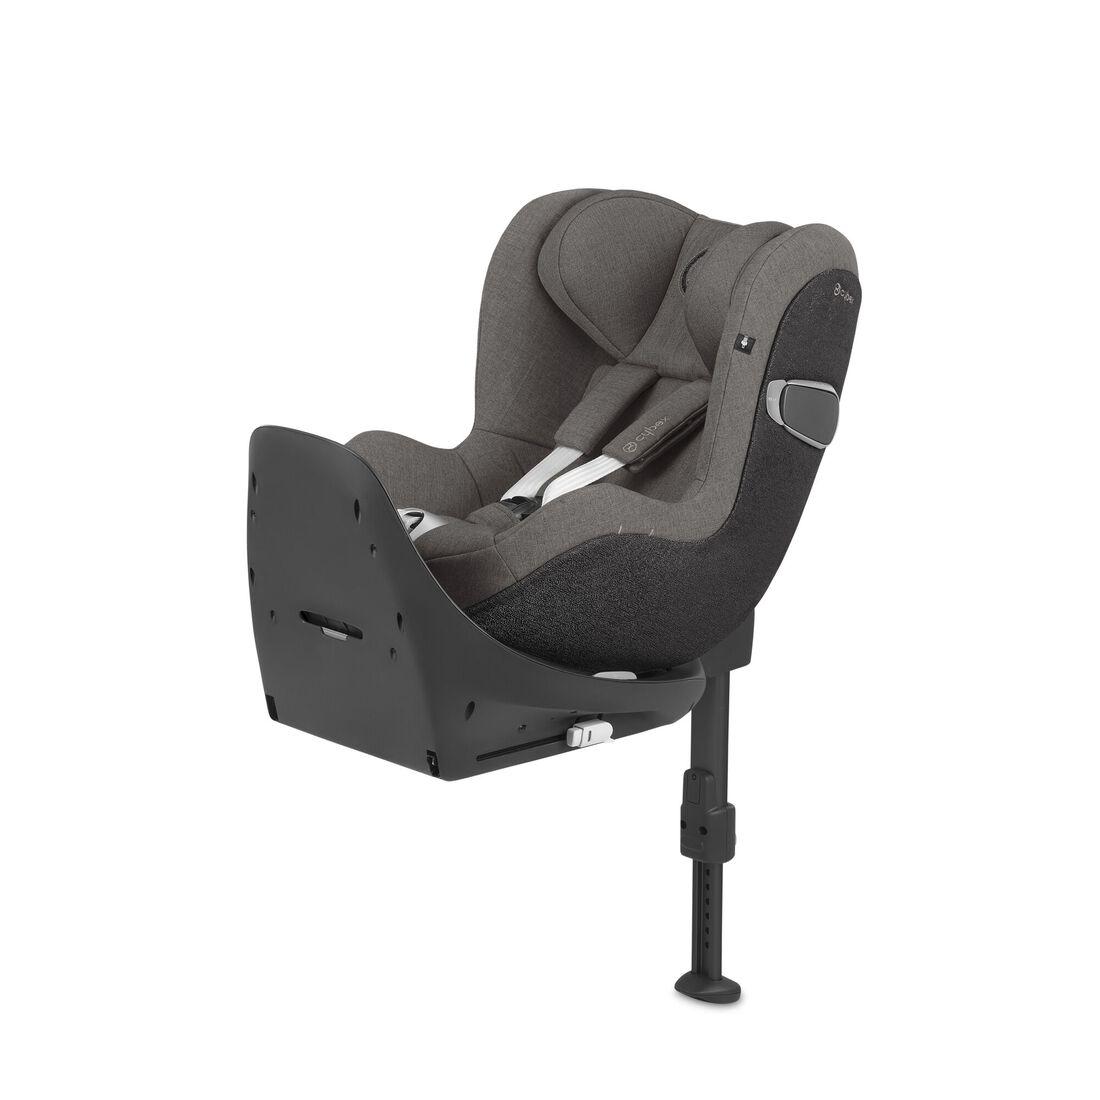 CYBEX Sirona Z i-Size - Soho Grey Plus in Soho Grey Plus large Bild 2